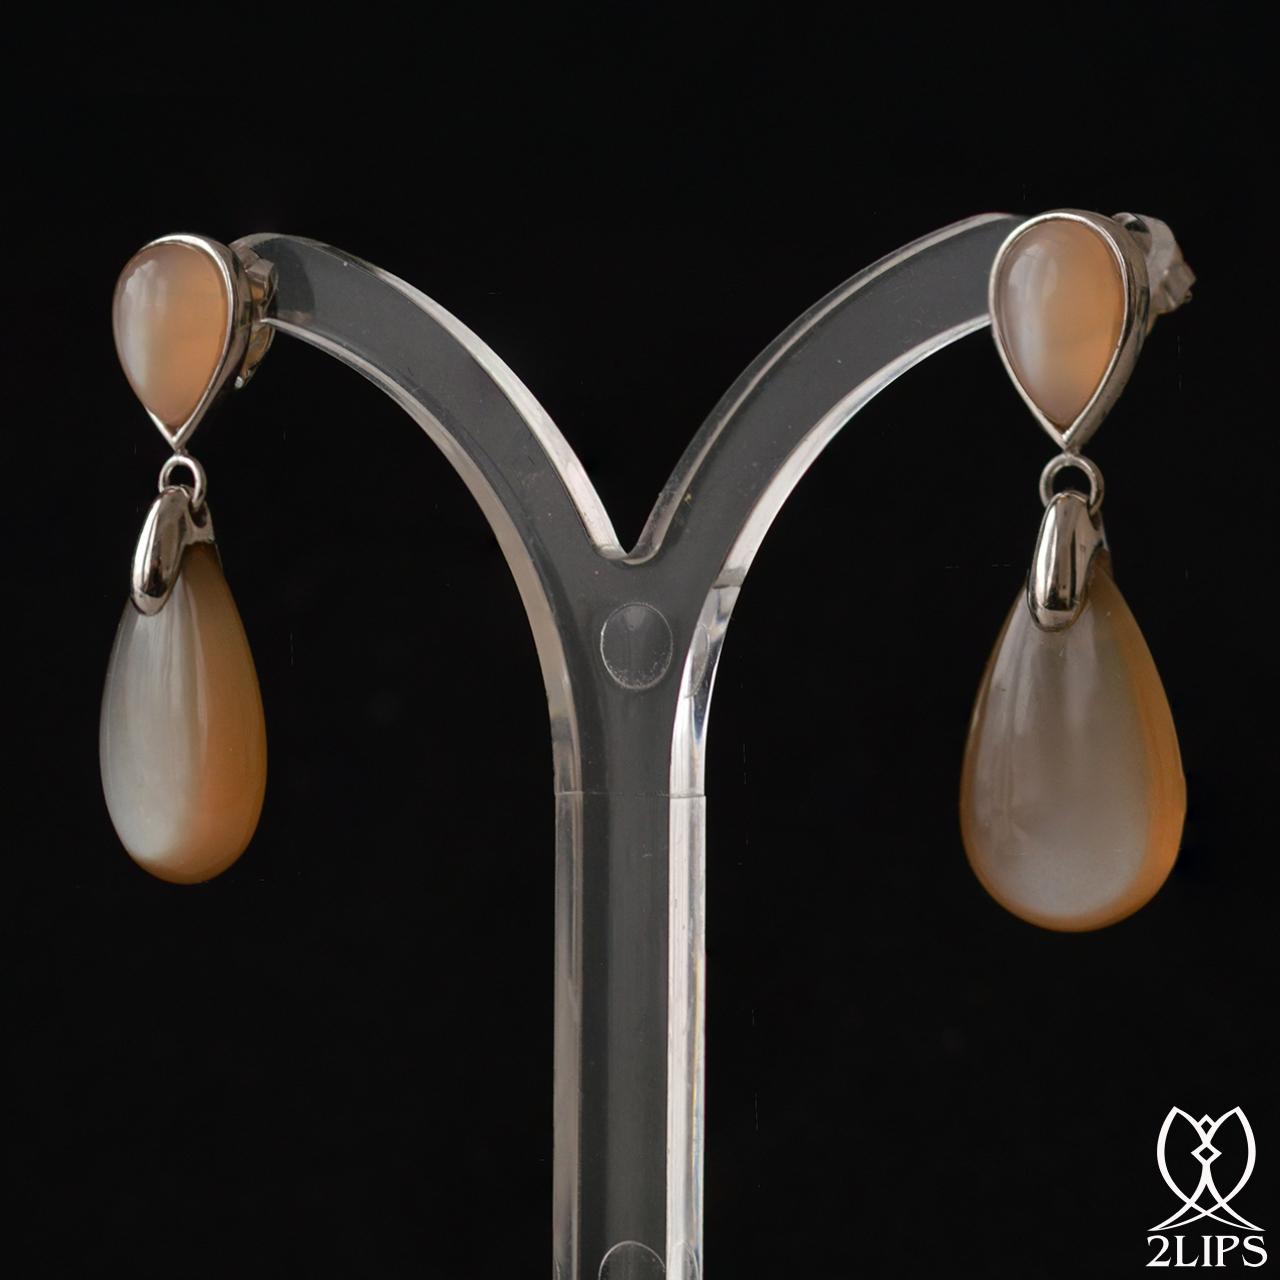 18k-white-gold-moonstone-2lips-colours-earrings-design-david-aardewerk